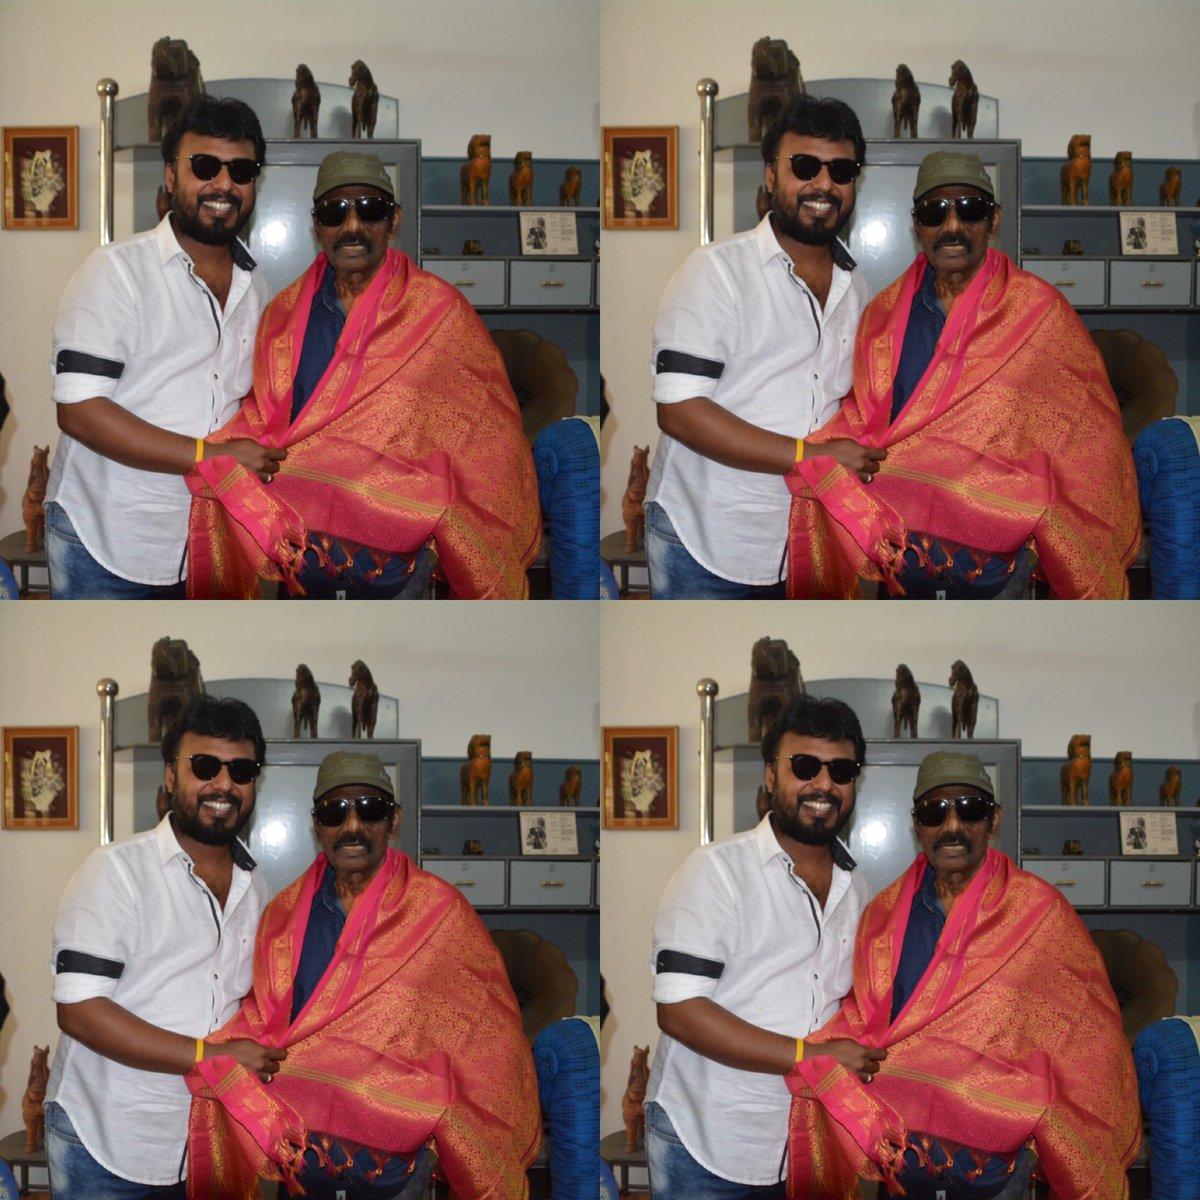 Wishing The king of comedy goundamani sir a very happy birthday.  #kpyaadhavan #comedy #king #goundamani #hbd #iconic #star https://t.co/eFTLs3Wv8e